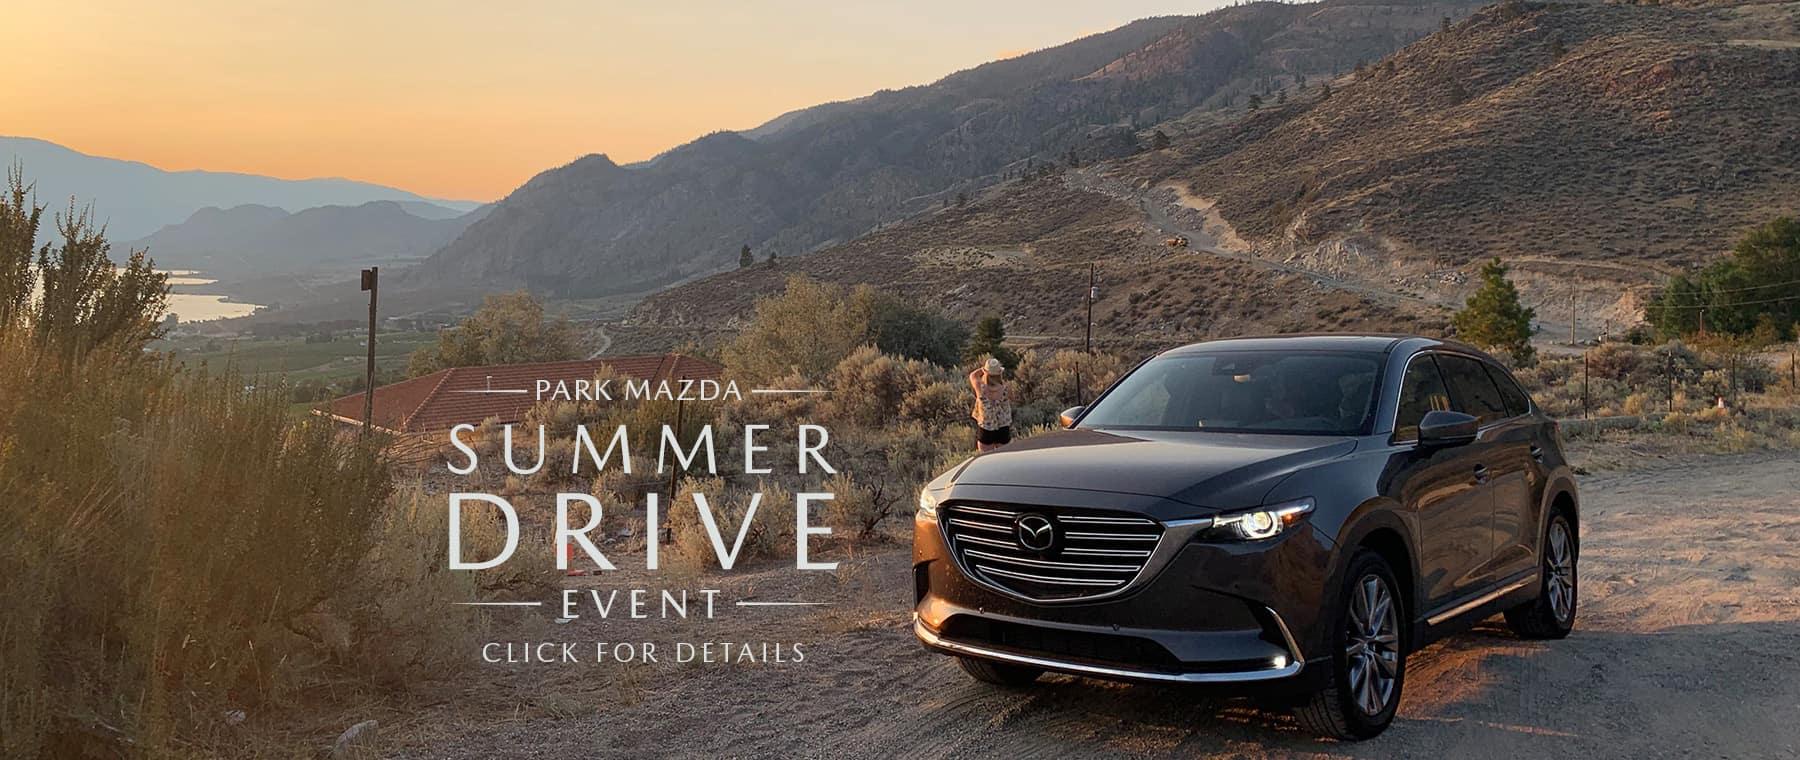 SUMMER_DRIVE_EVENT_2021_Desktop_Homepage_1800x760px